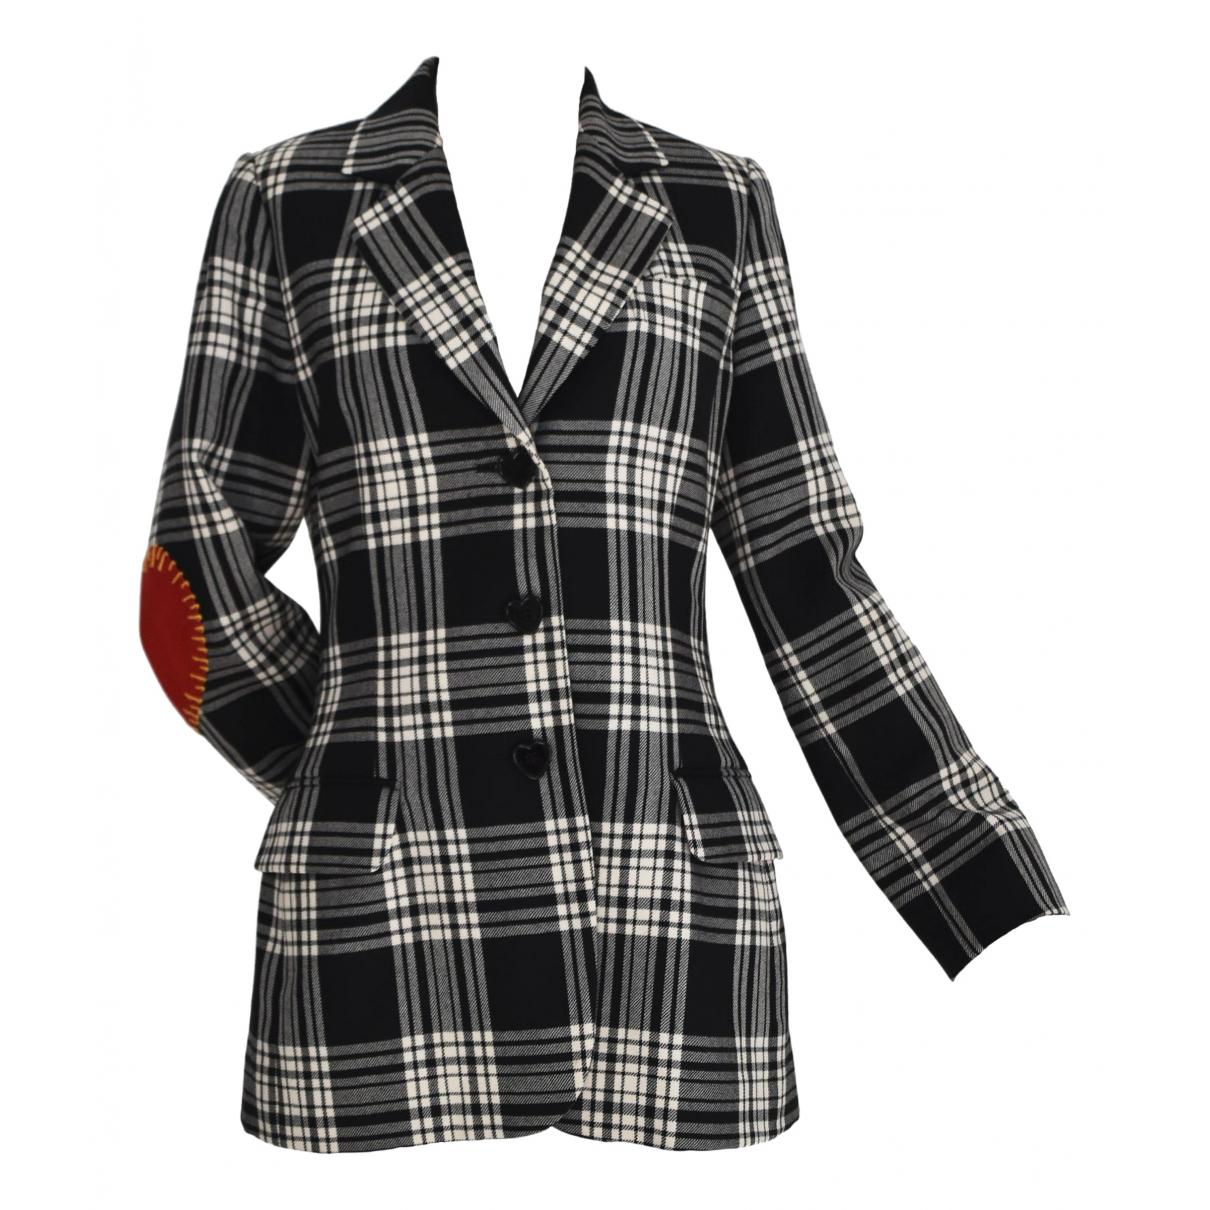 Moschino \N Black Wool jacket for Women M International